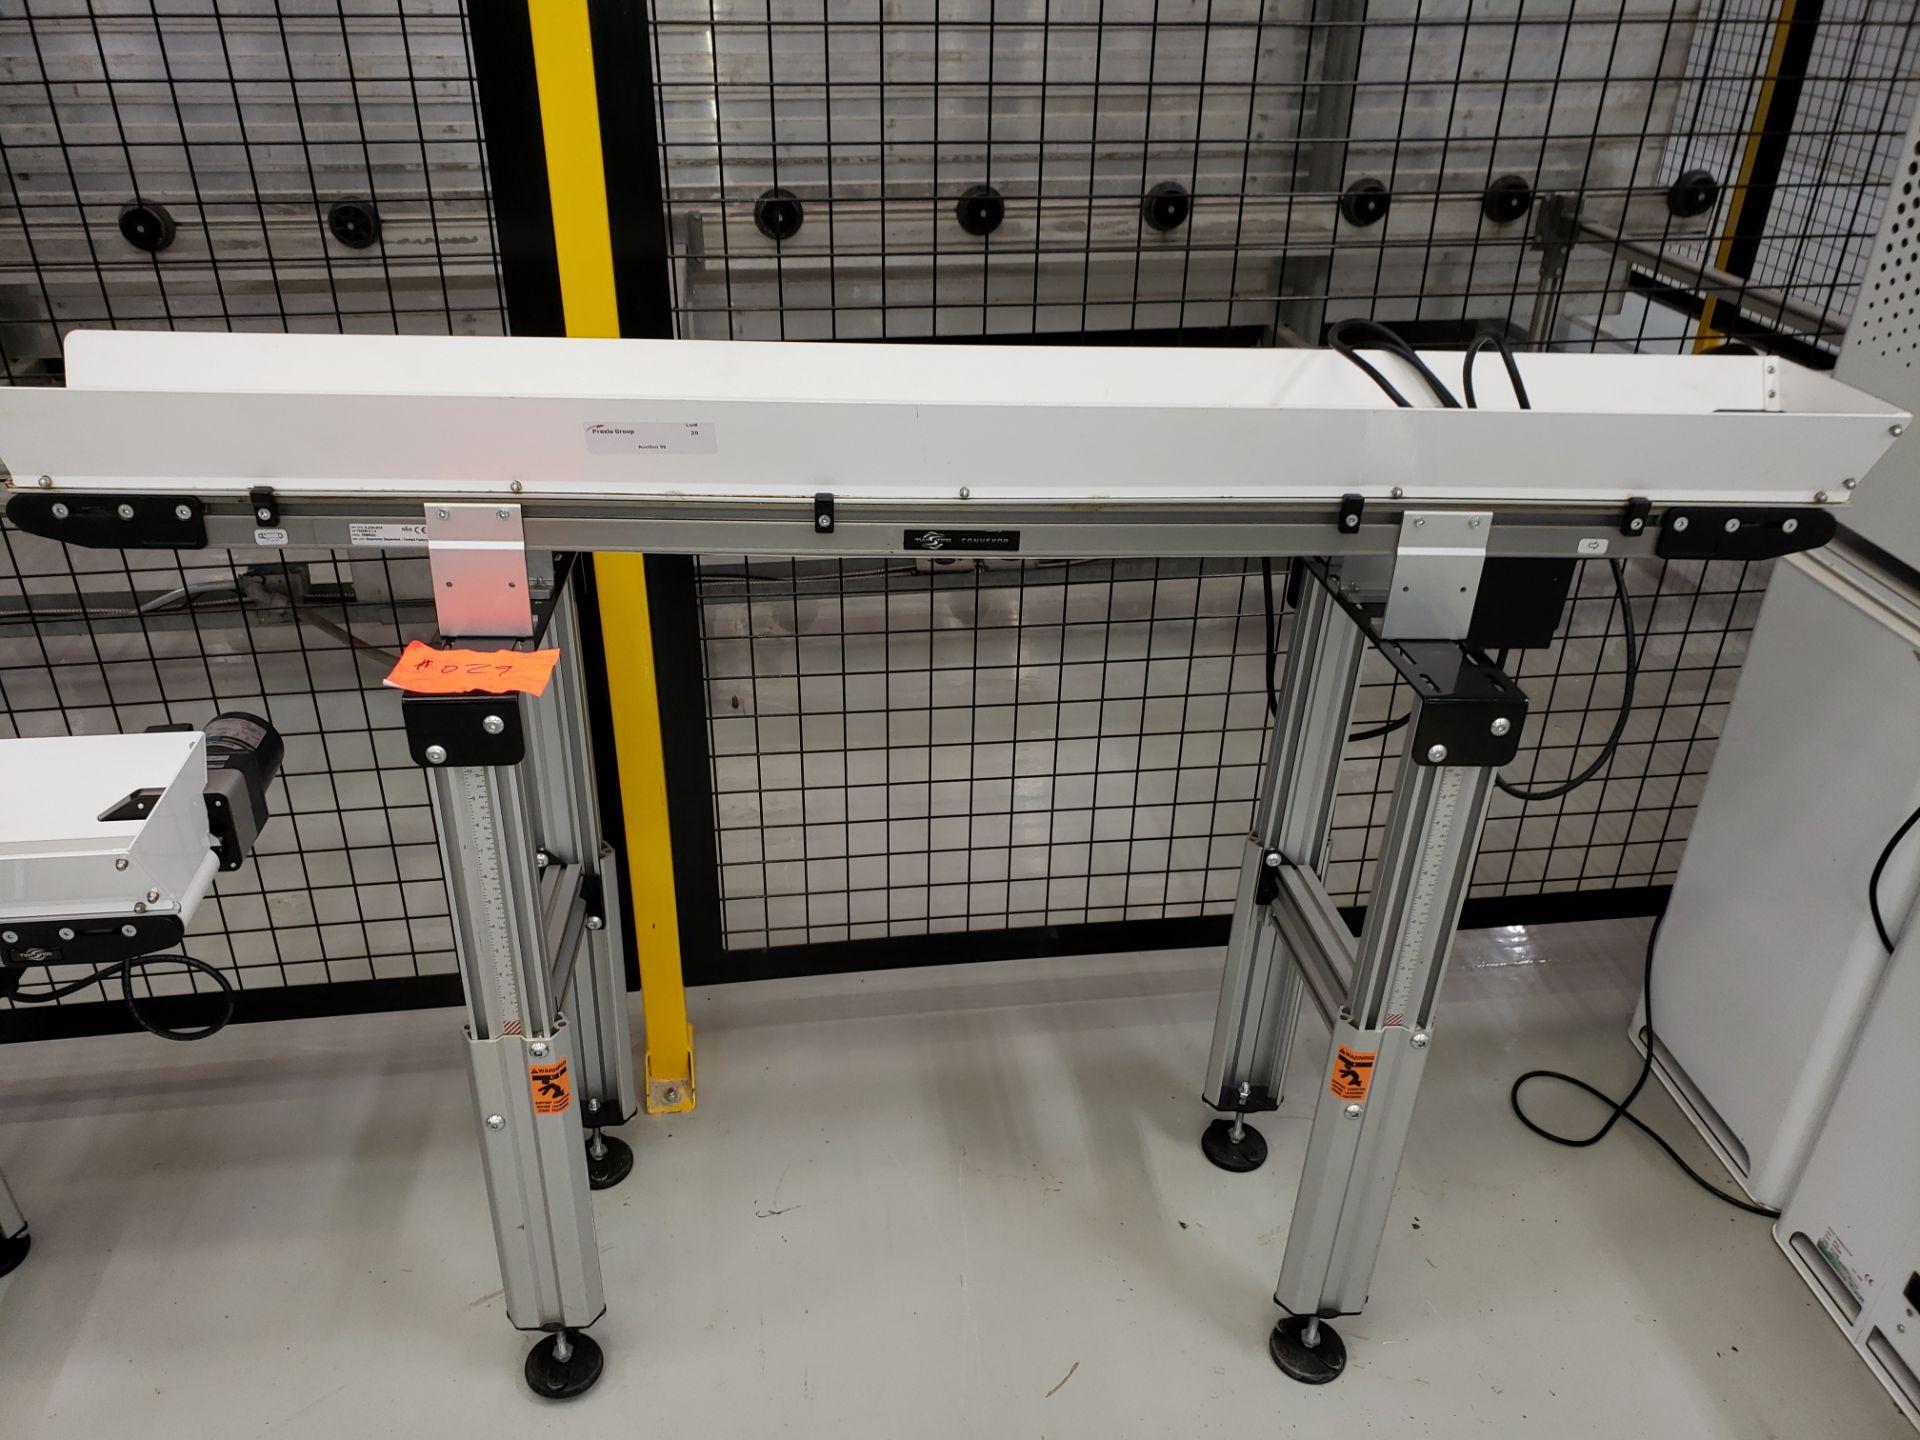 Kierton Twister Input Conveyor 5.5' - Image 2 of 9